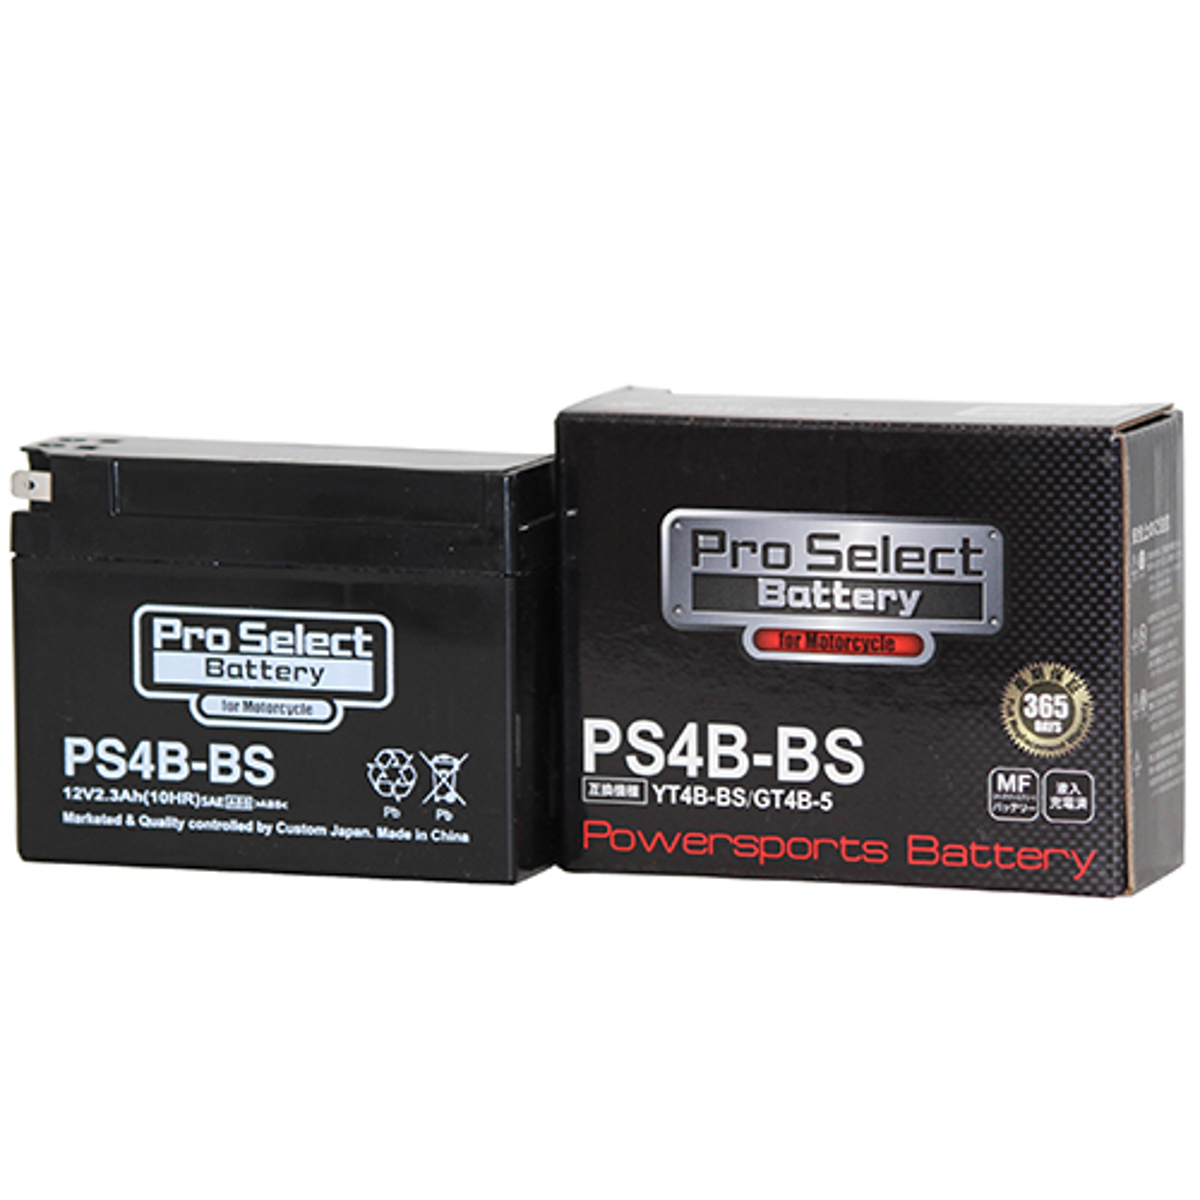 【1個売り】PS4B-BS (YT4B-BS、GT4B-5 互換)(液入充電済)